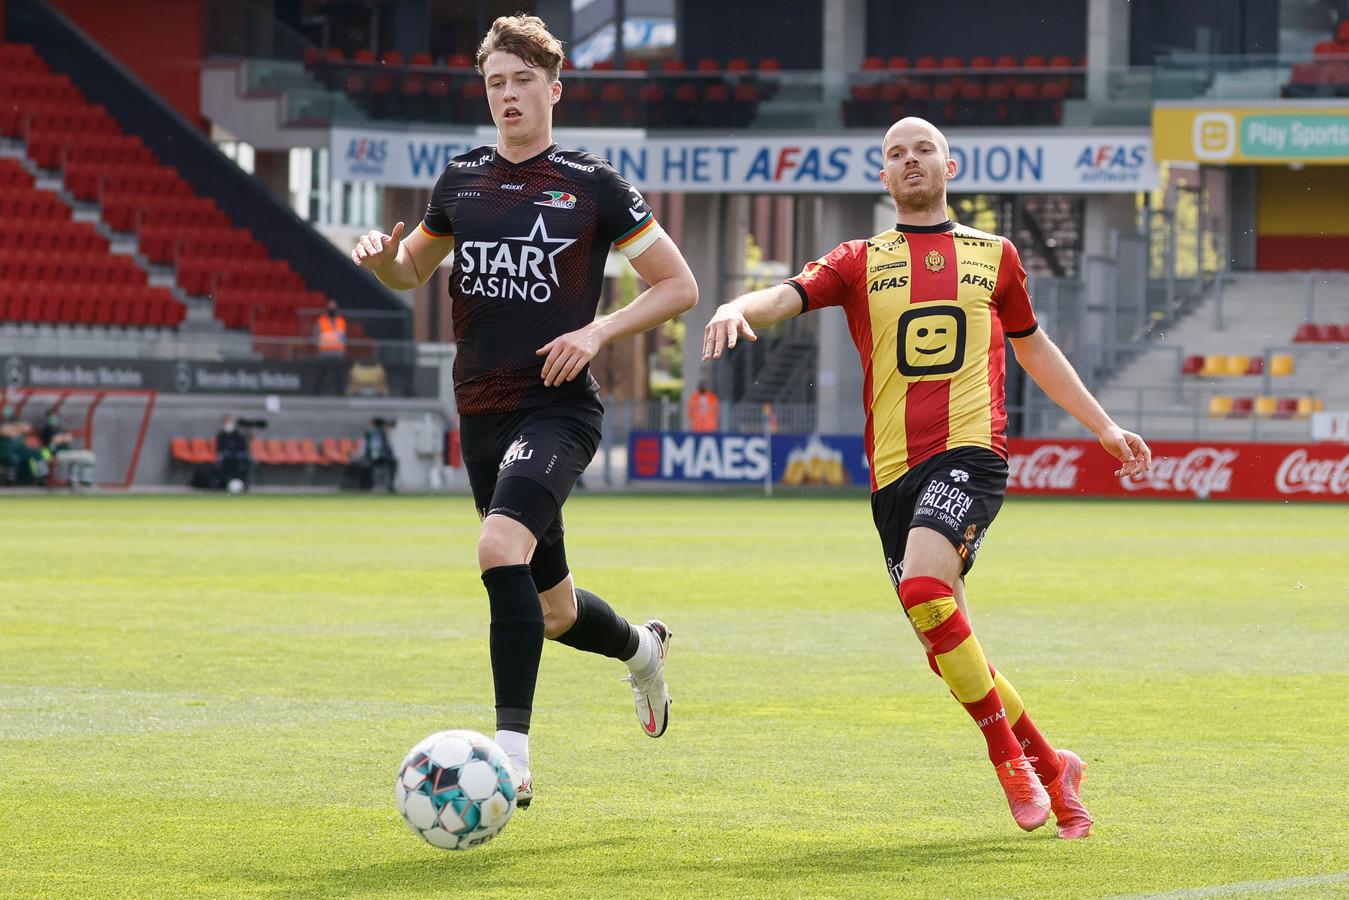 KVO-verdediger Jack Hendry (l.) houdt Geoffrey Hairemans van KV Mechelen af